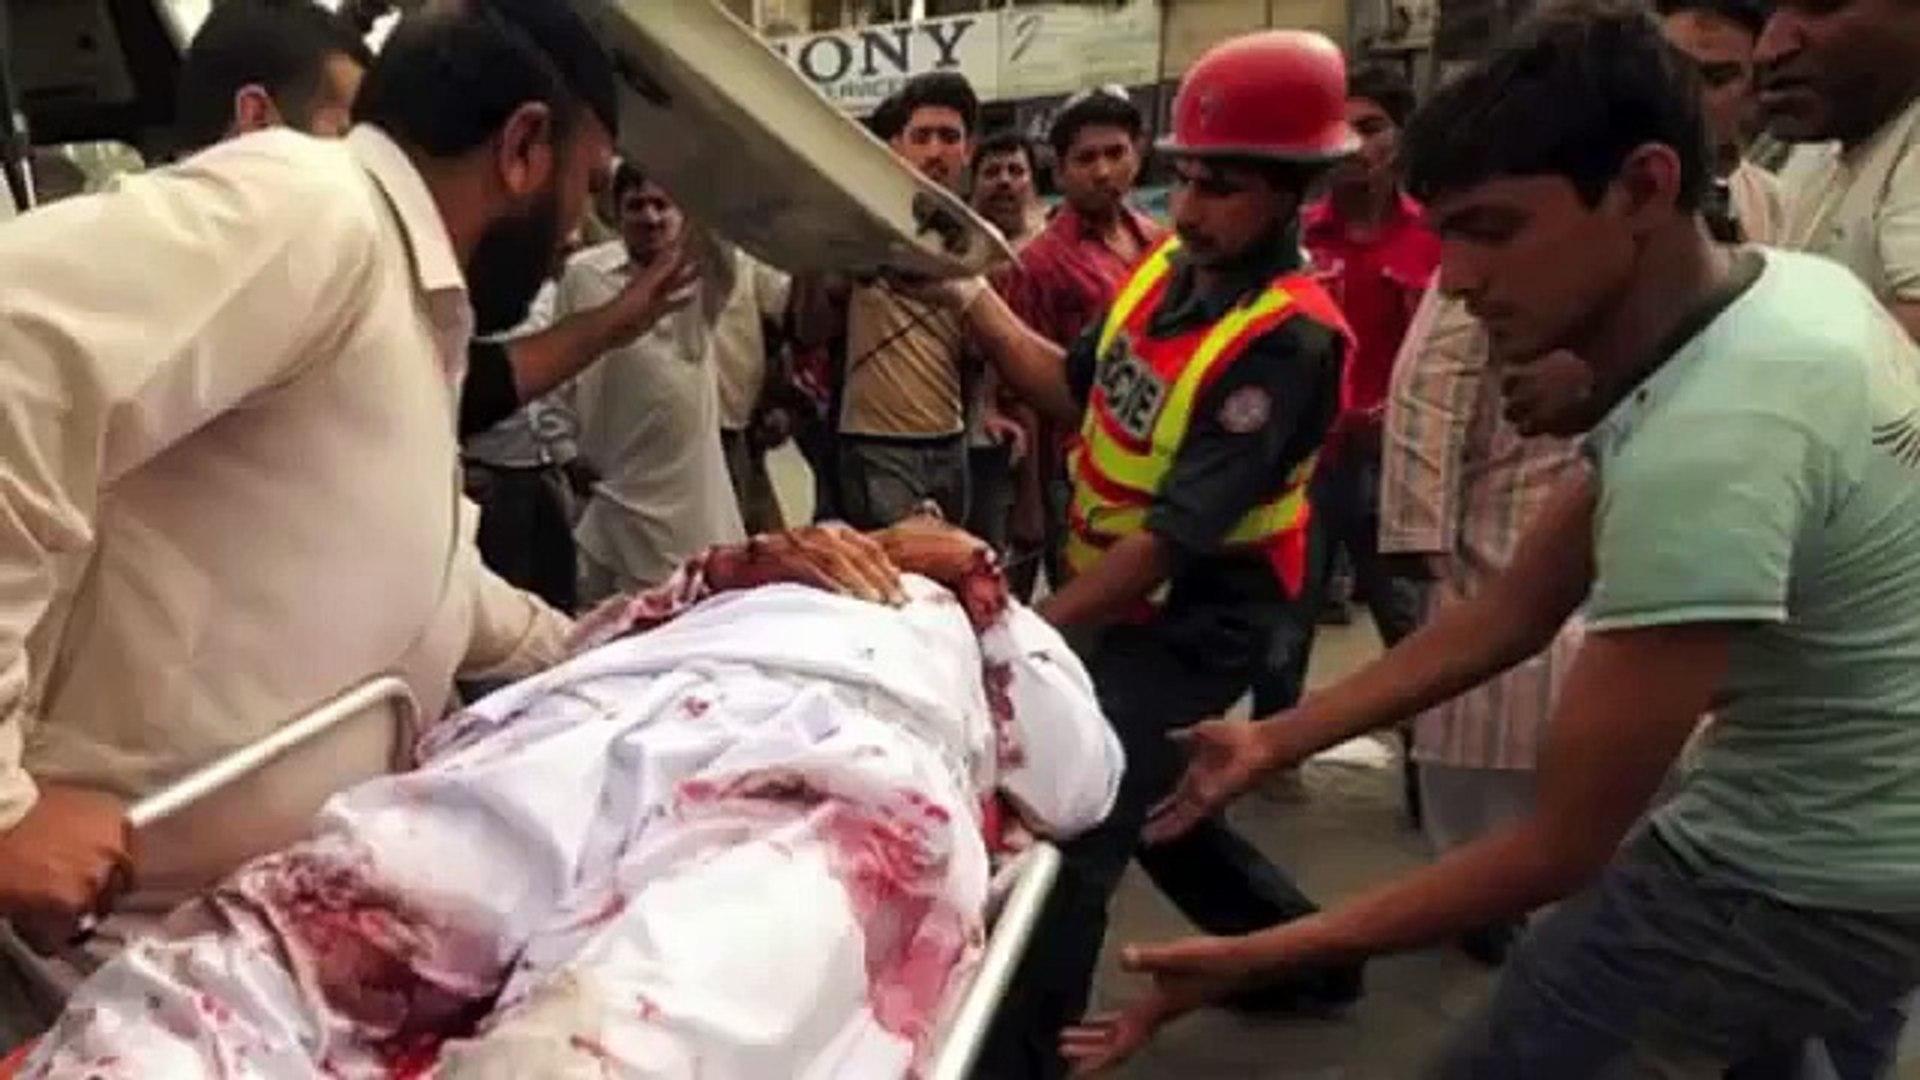 State Sponsored religious discrimination in Pakistan